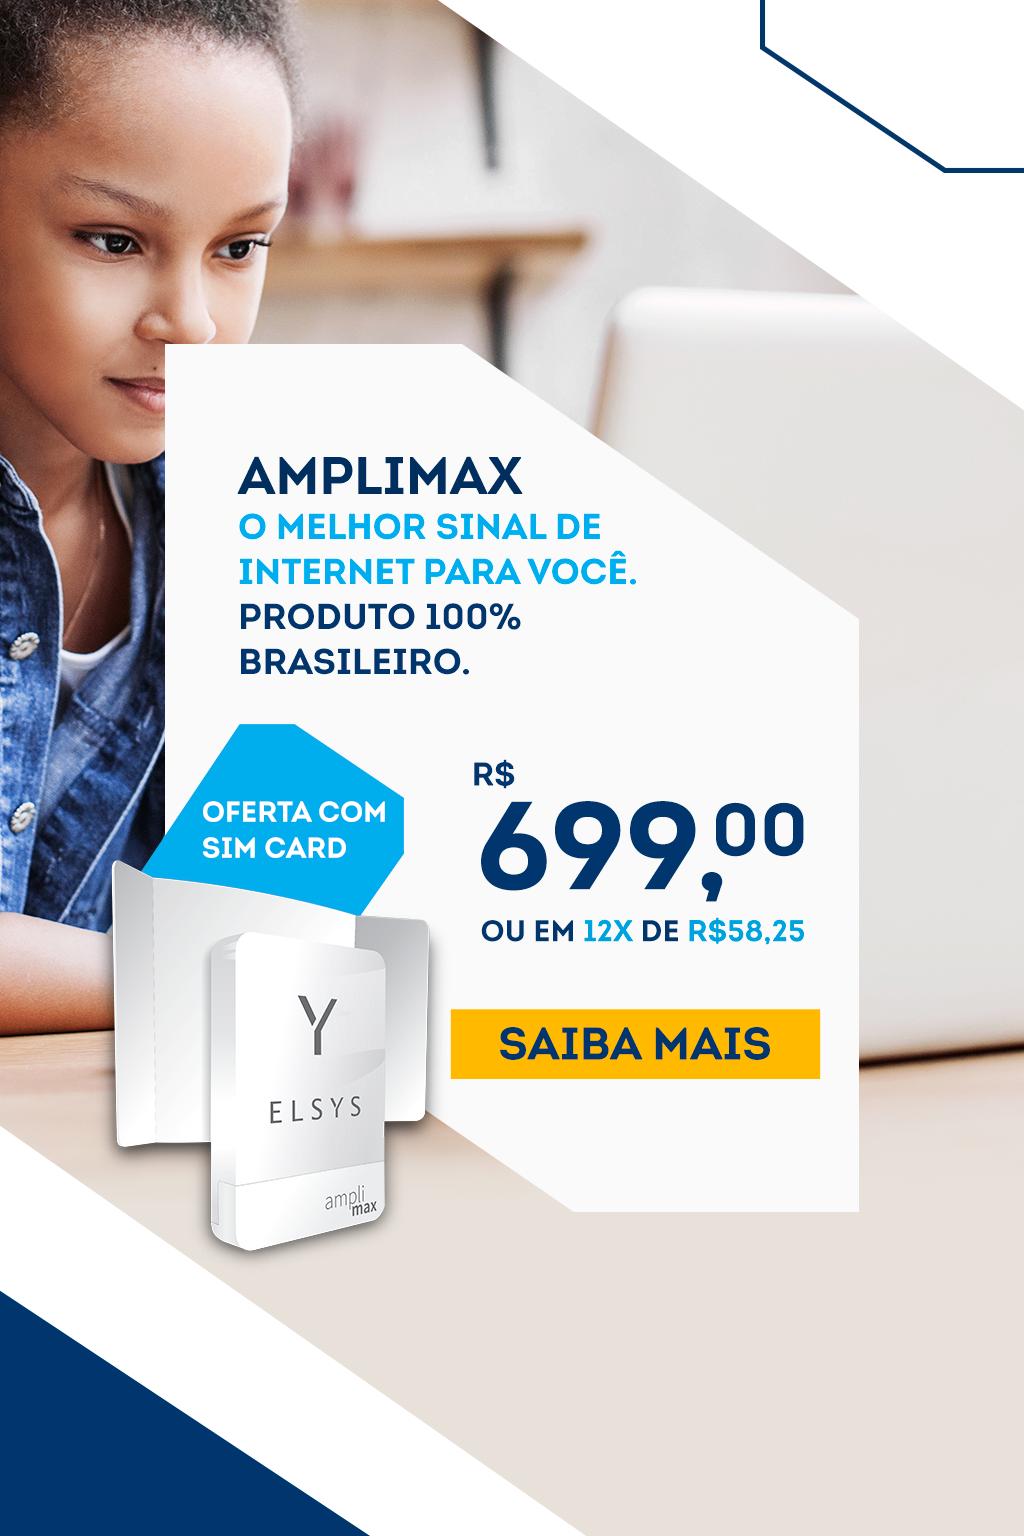 Amplimax